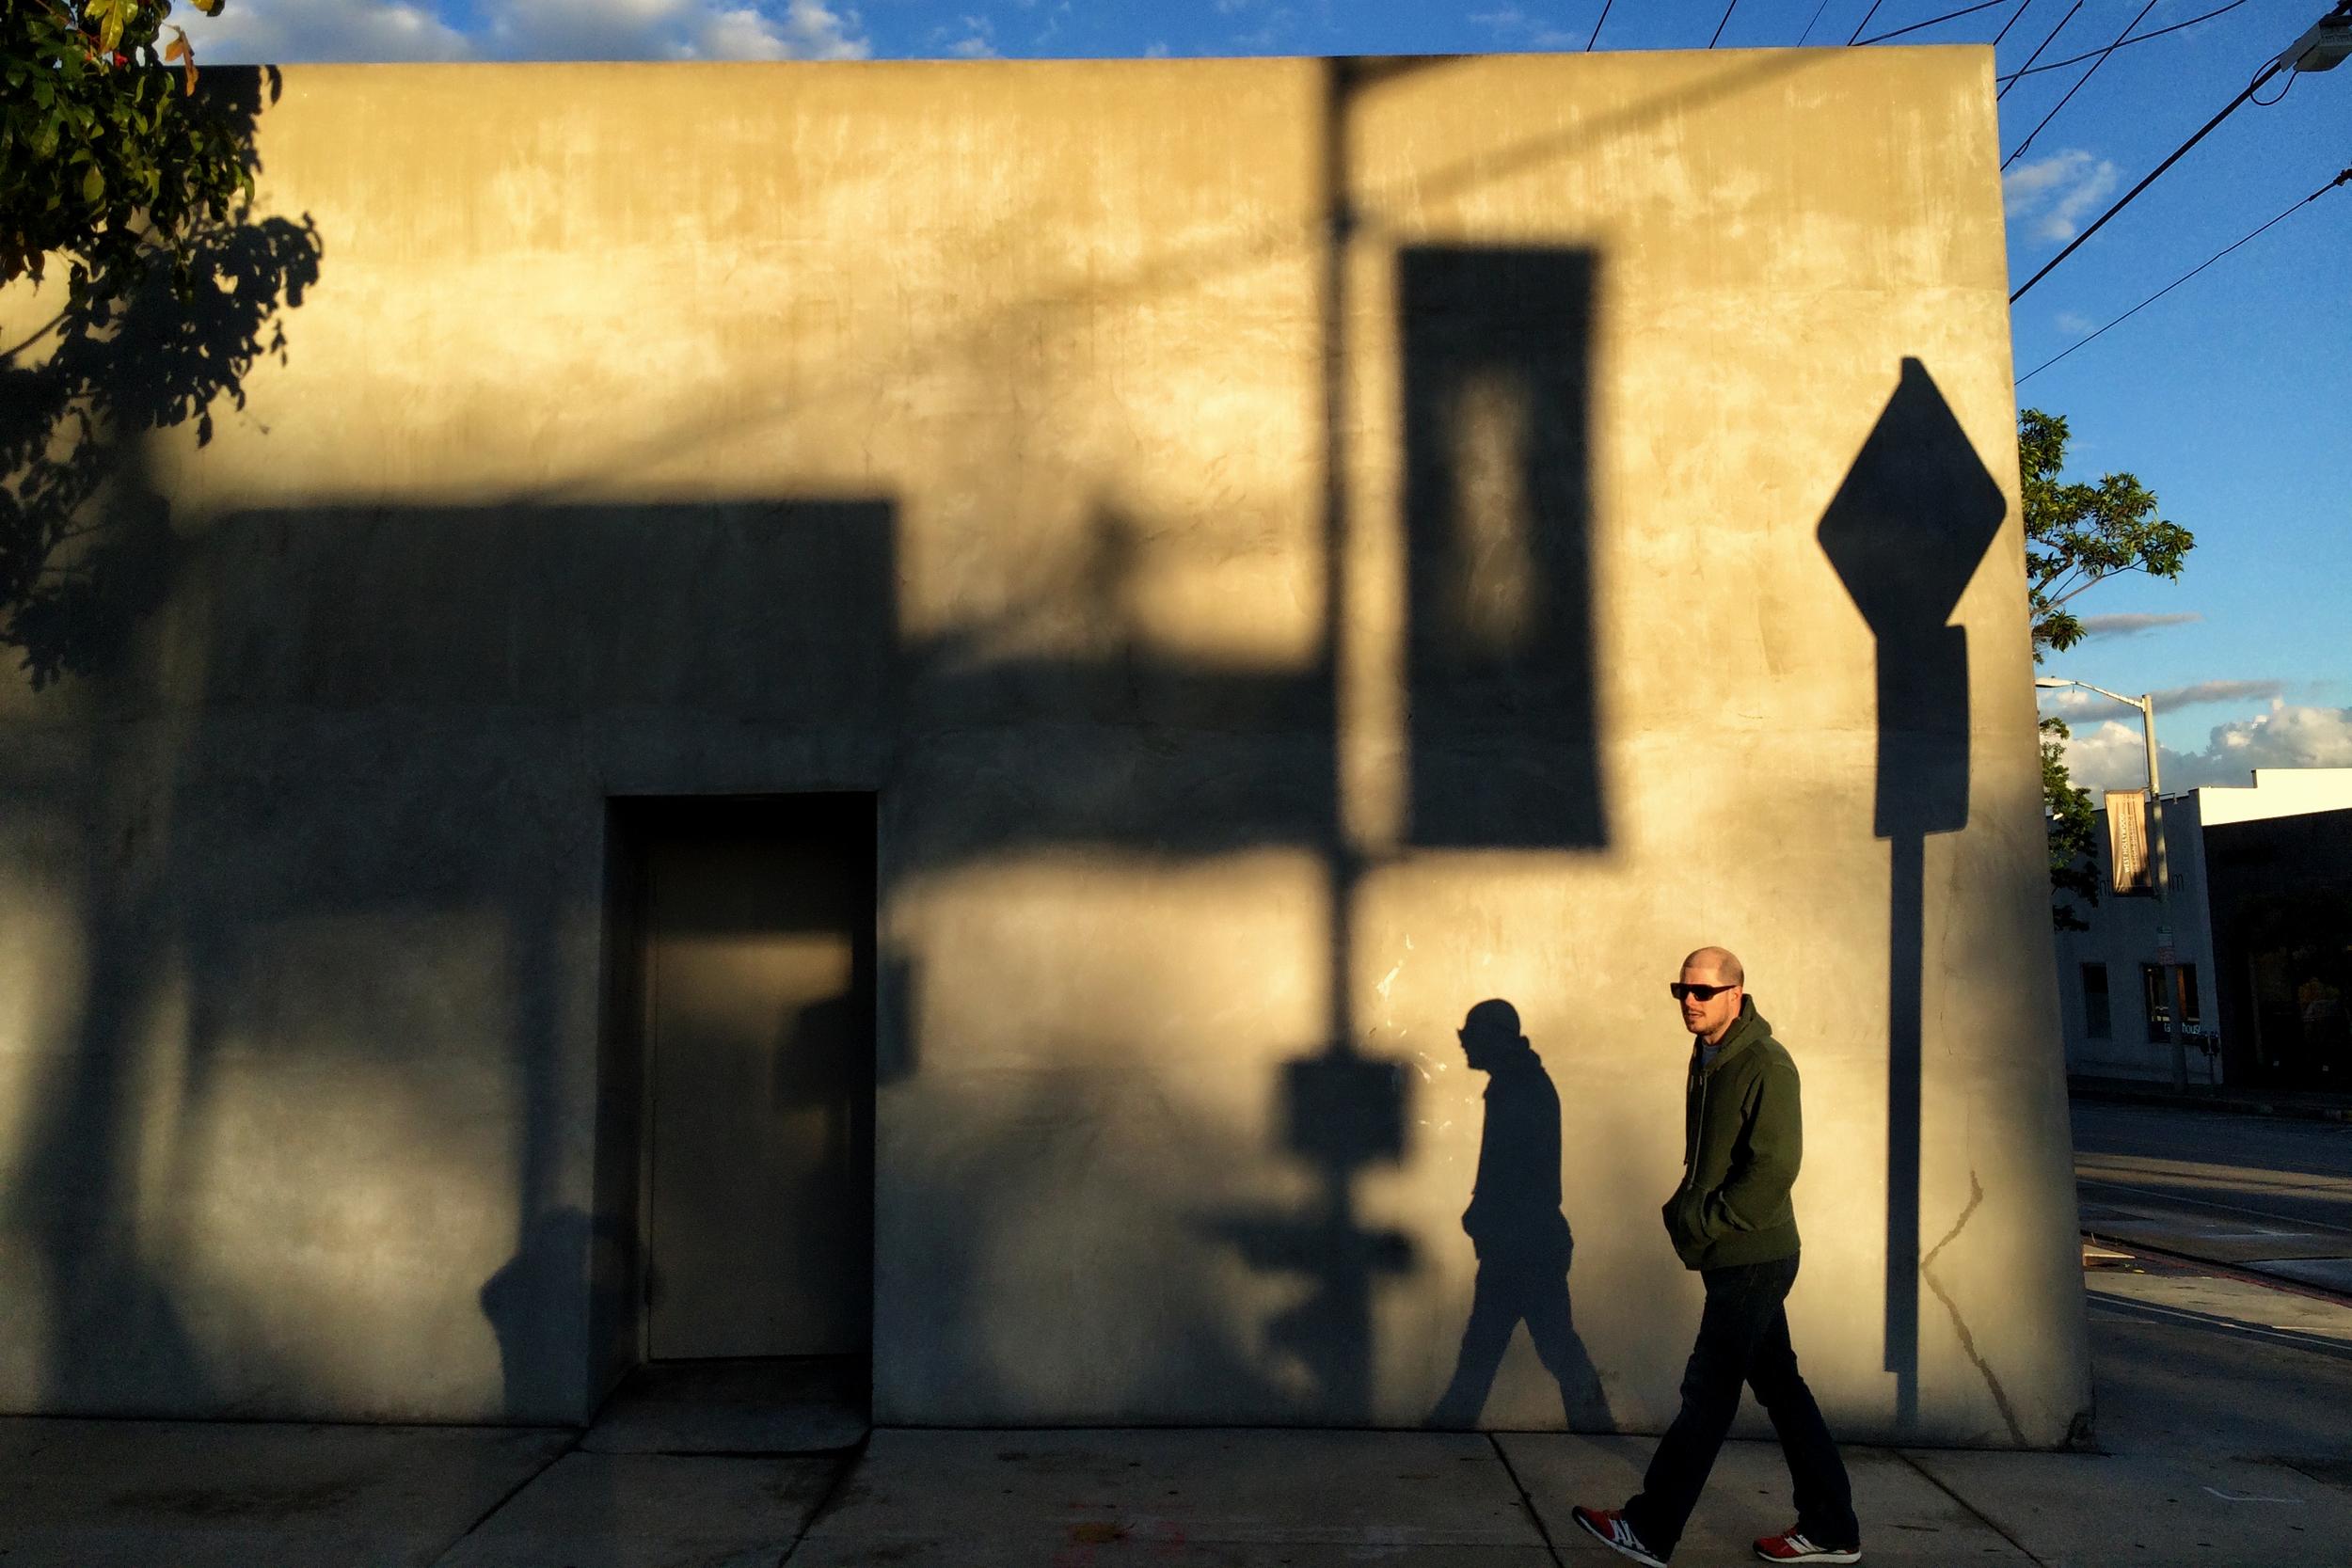 man-walks-down-melrose-after-a-rain-storm-los-angeles-weho.jpg